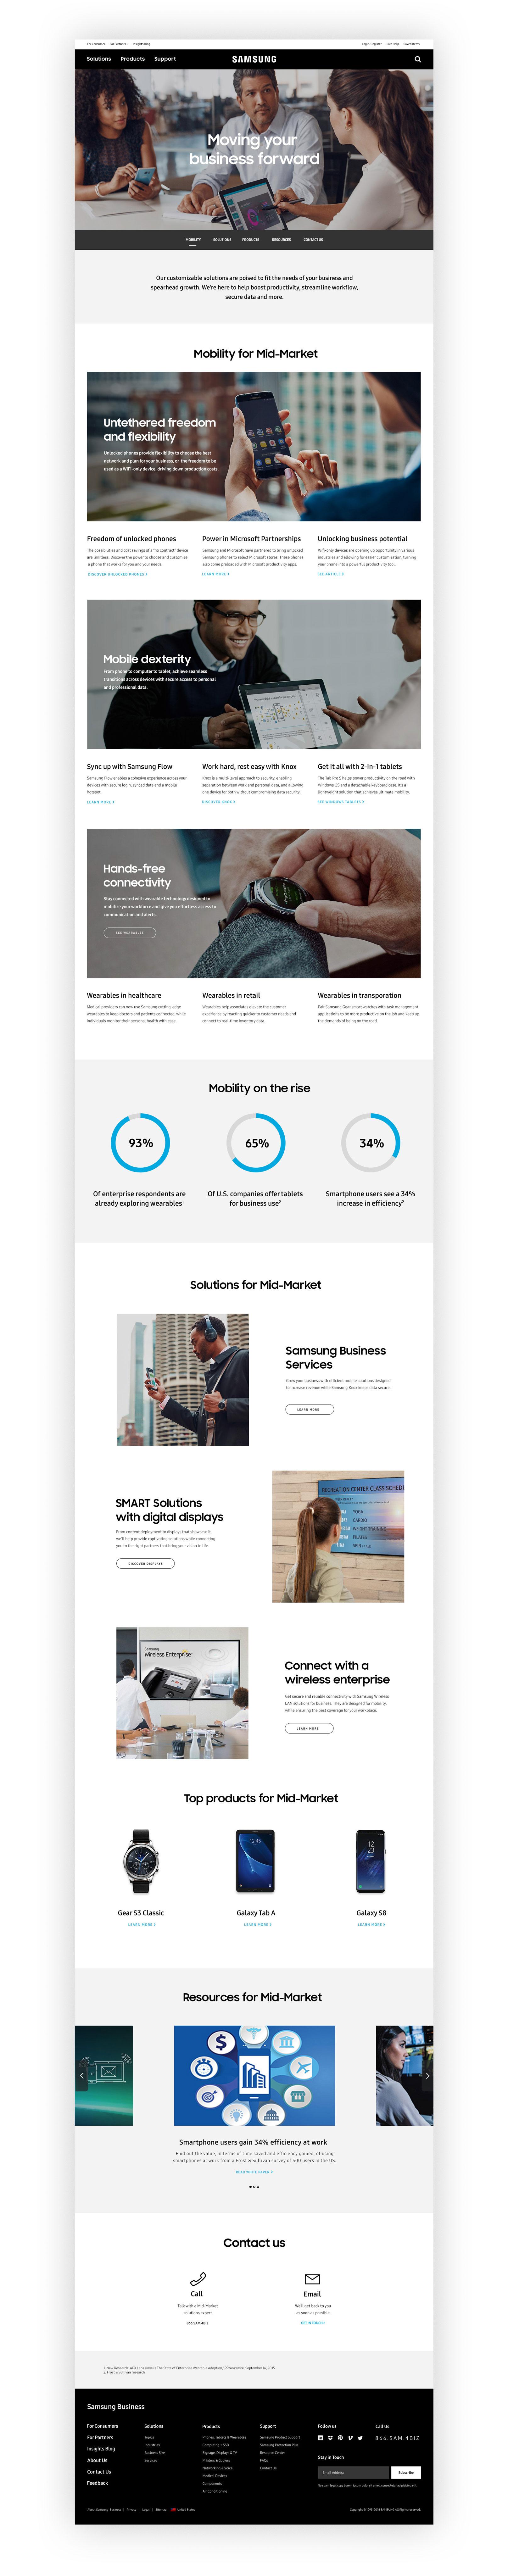 Samsung-B2B_Mid-Market.jpg